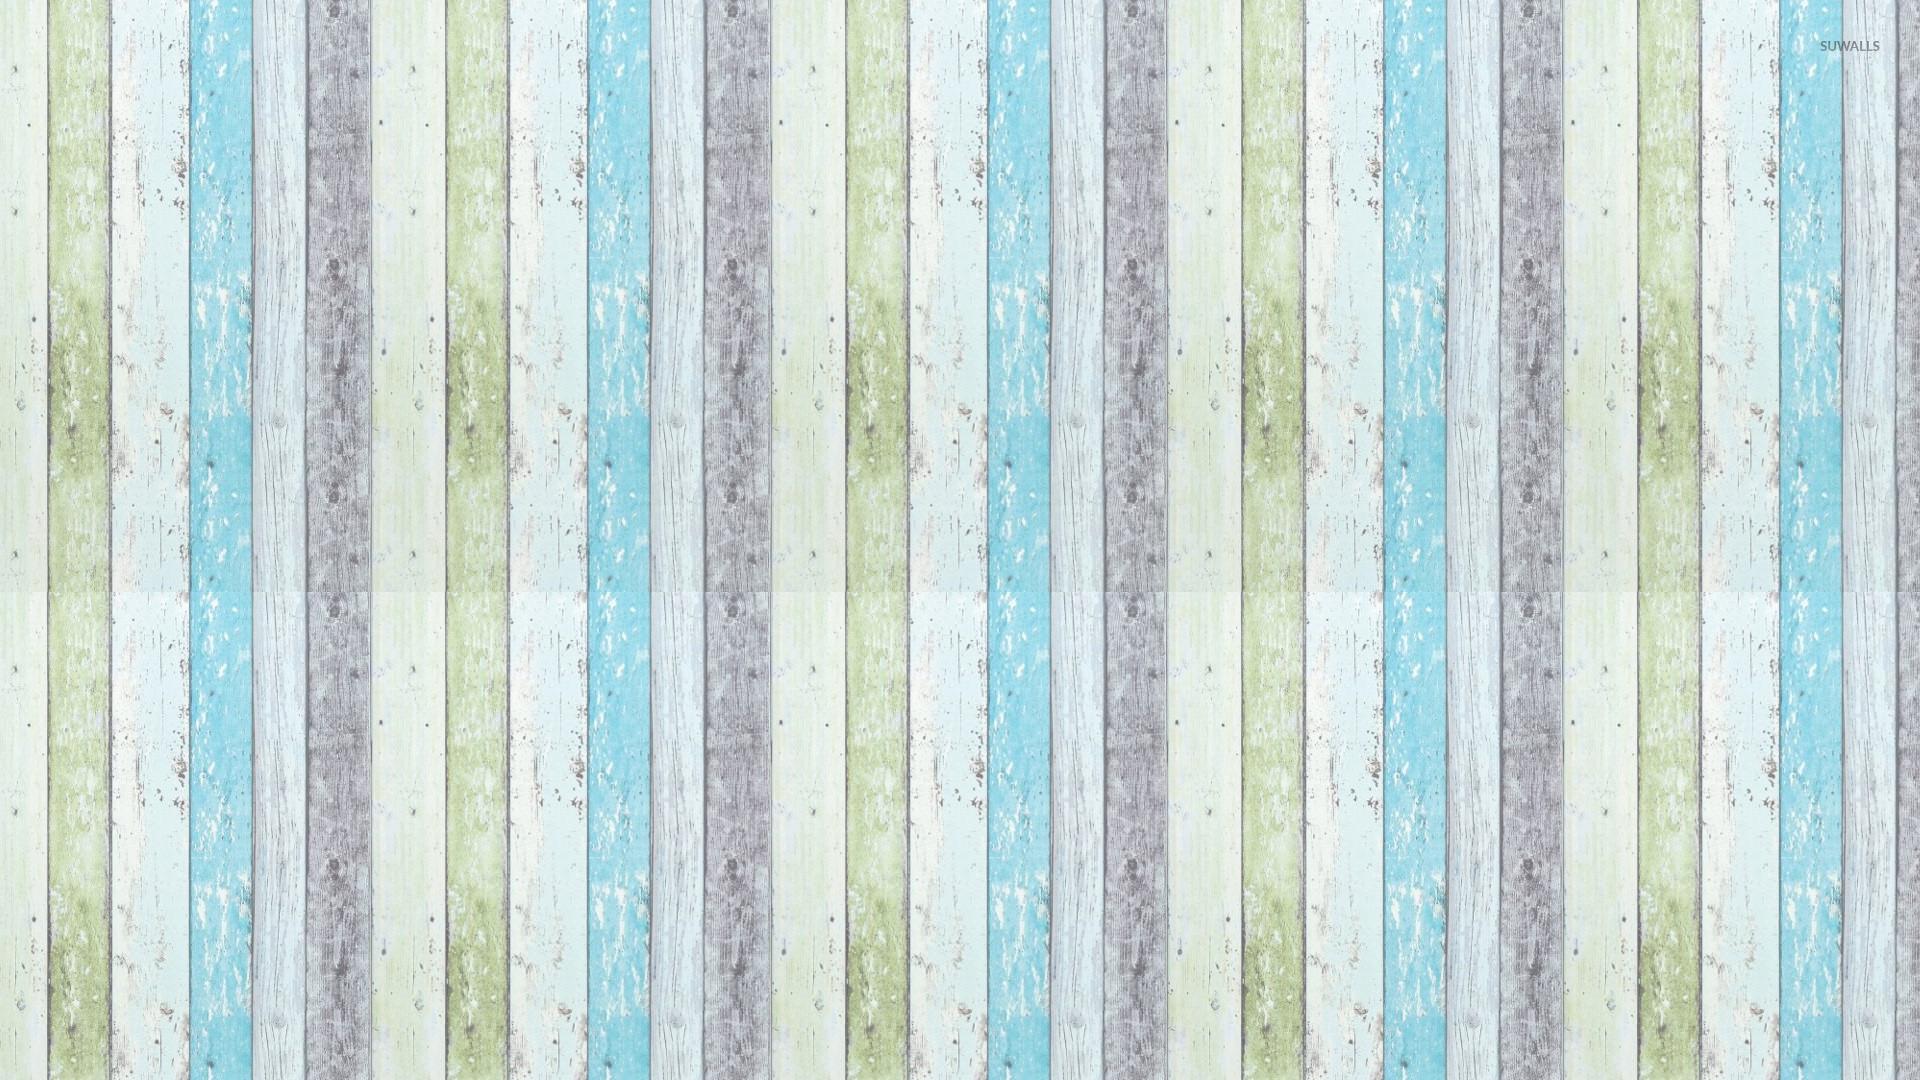 Wood texture wallpaper digital art wallpapers 22848 wood texture wallpaper voltagebd Choice Image